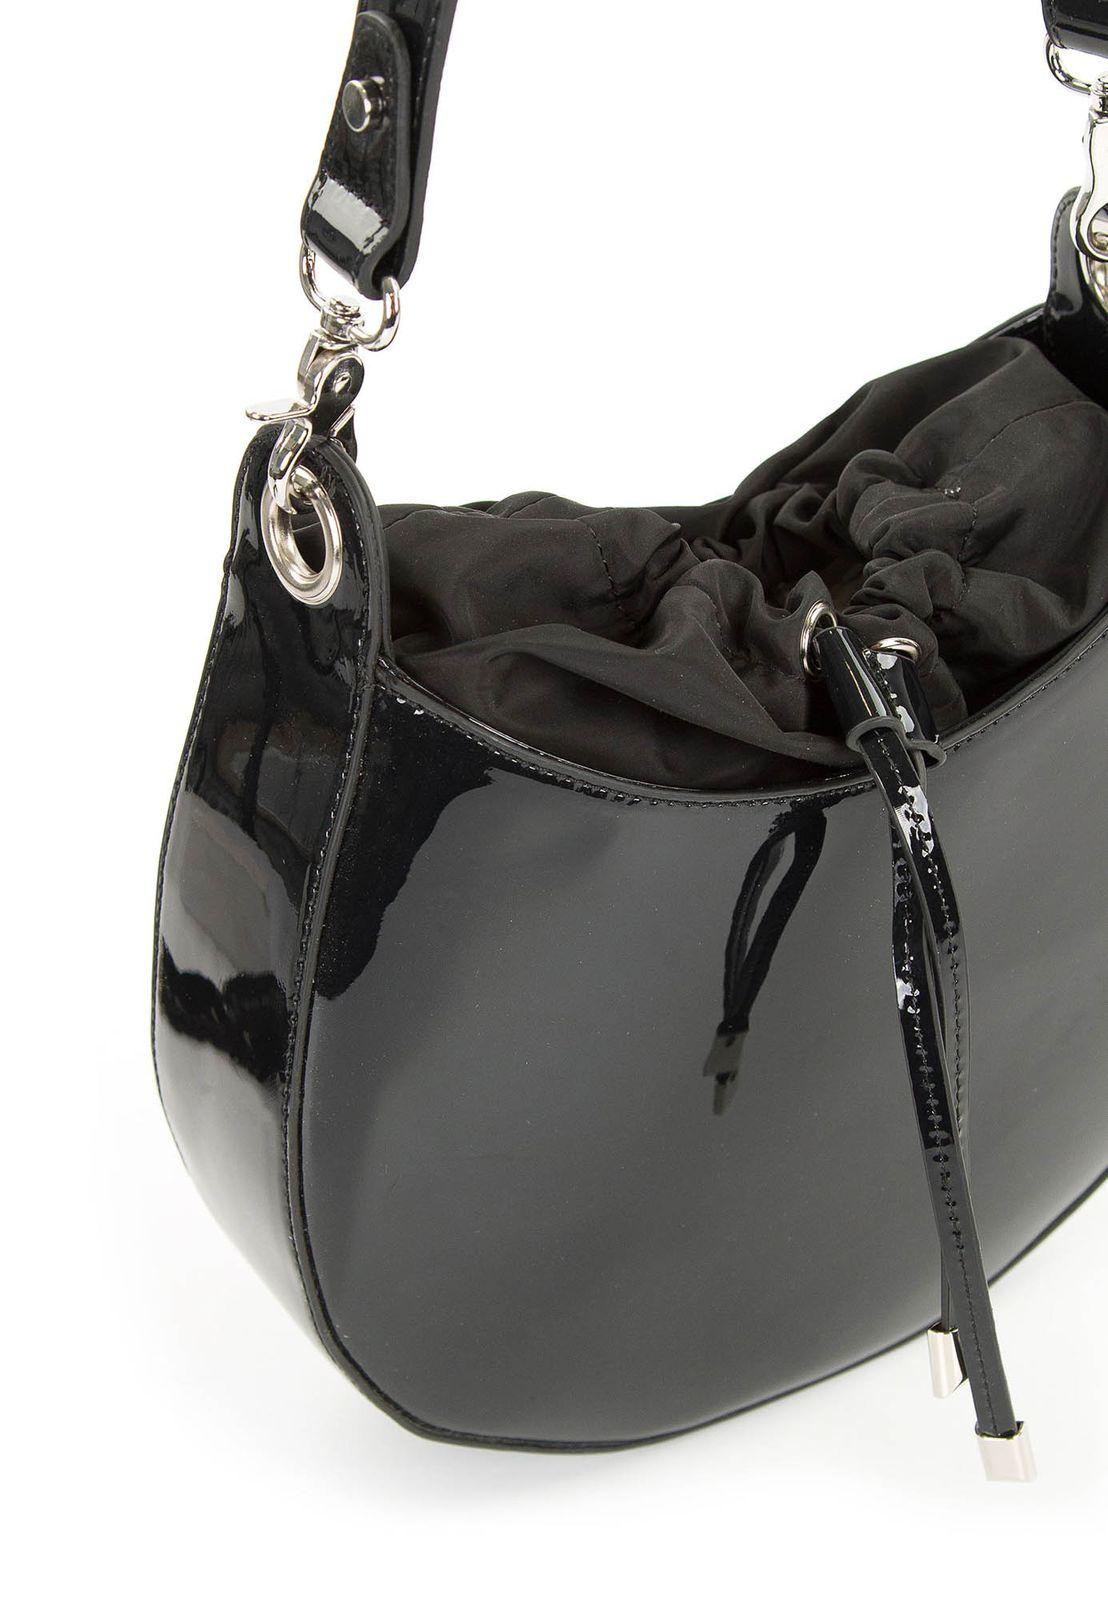 Tamaris Nelli Shoulder Bag Schultertasche Tasche Bordeaux Rot Neu